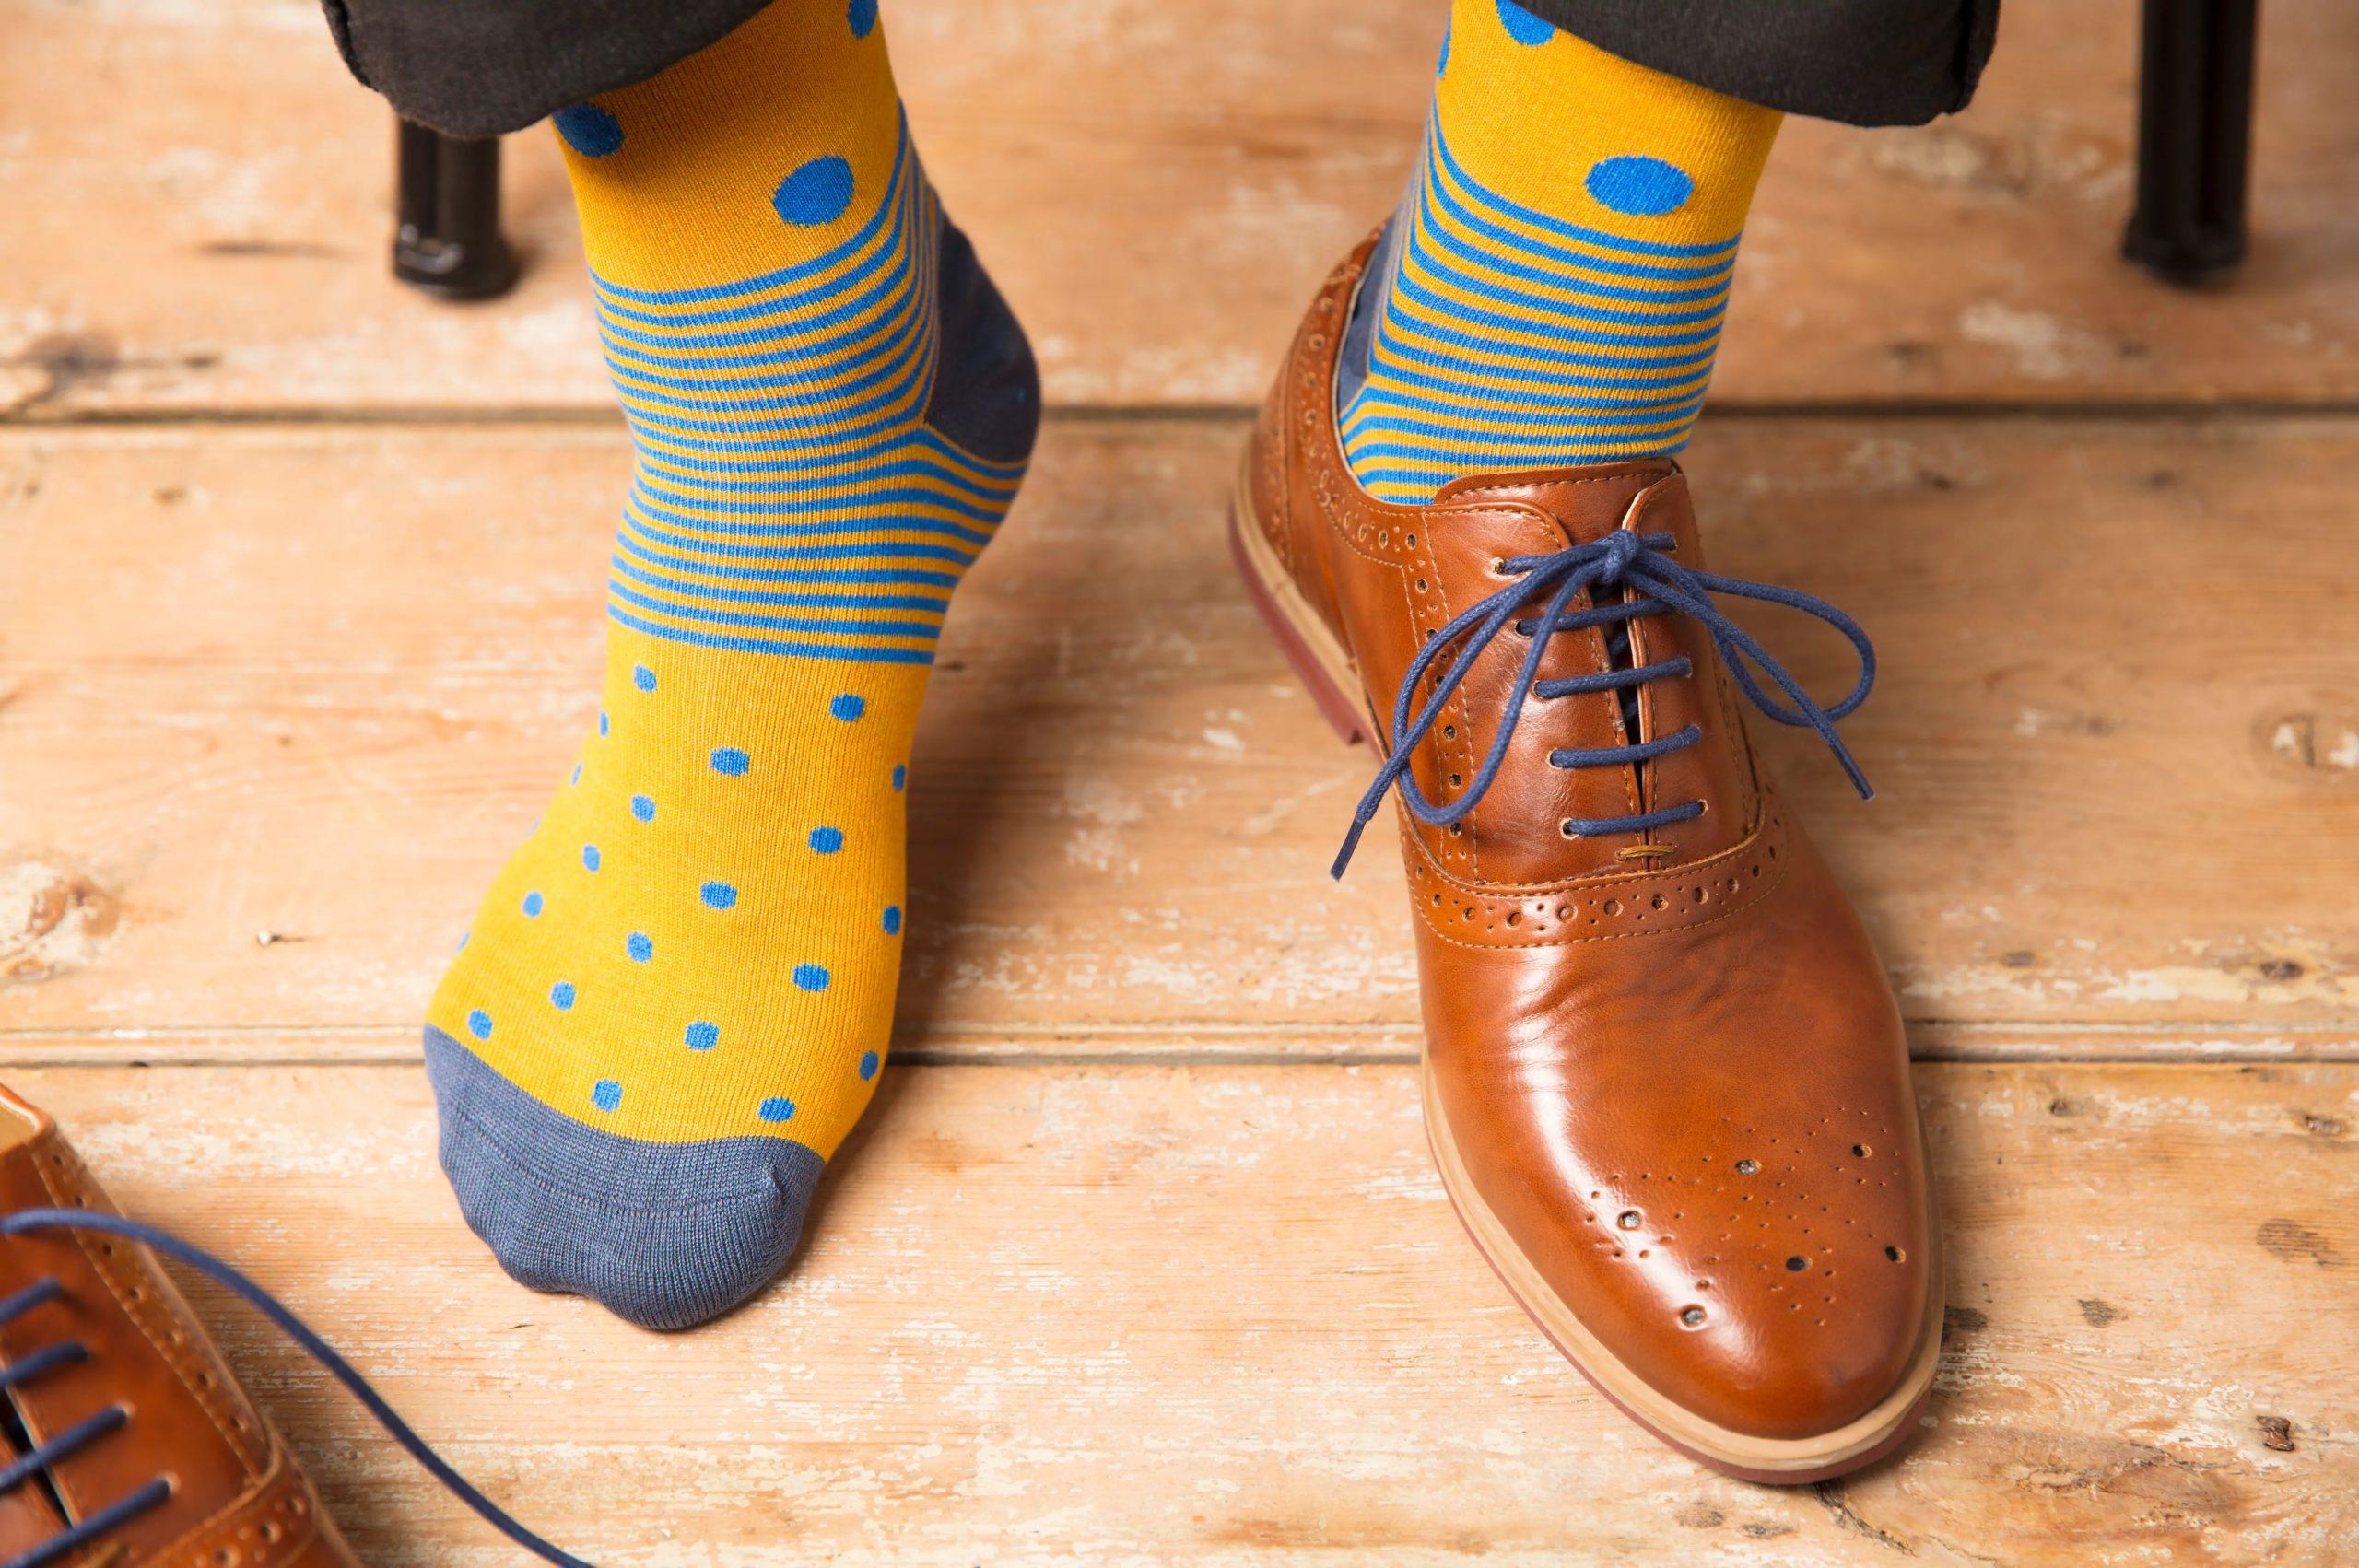 протирка для обуви